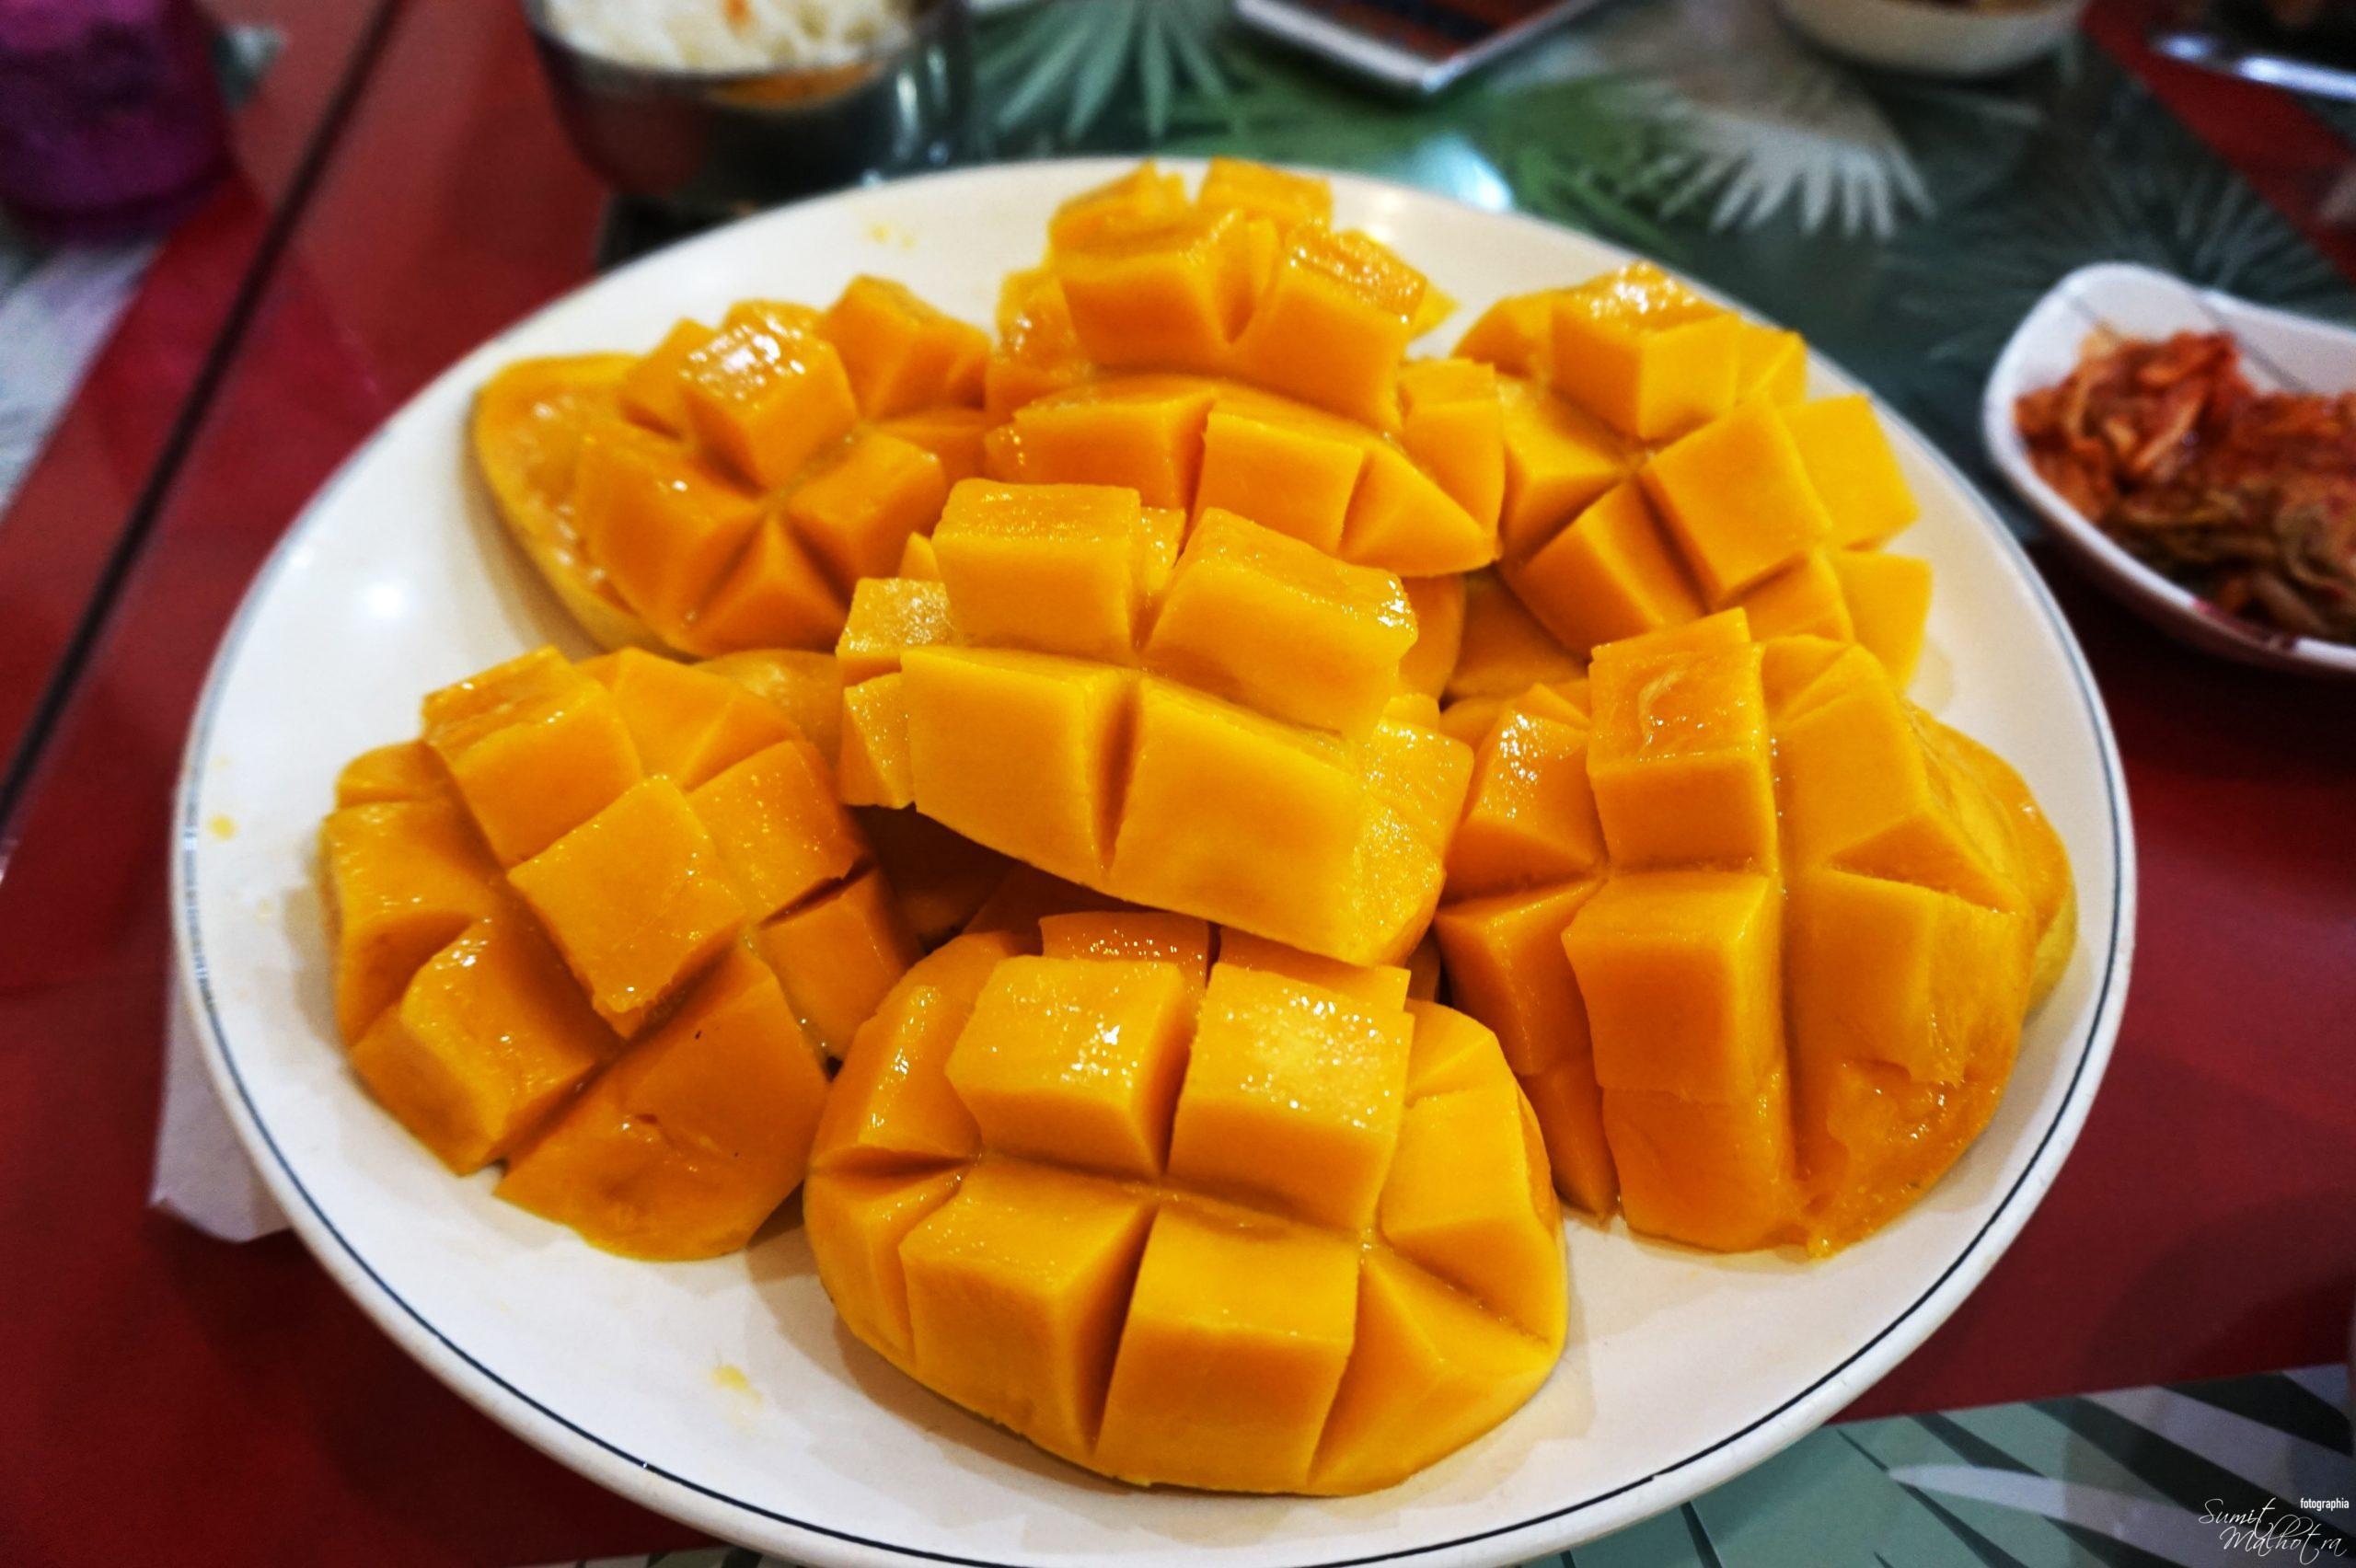 Sliced Mango for Mango Ice Cream